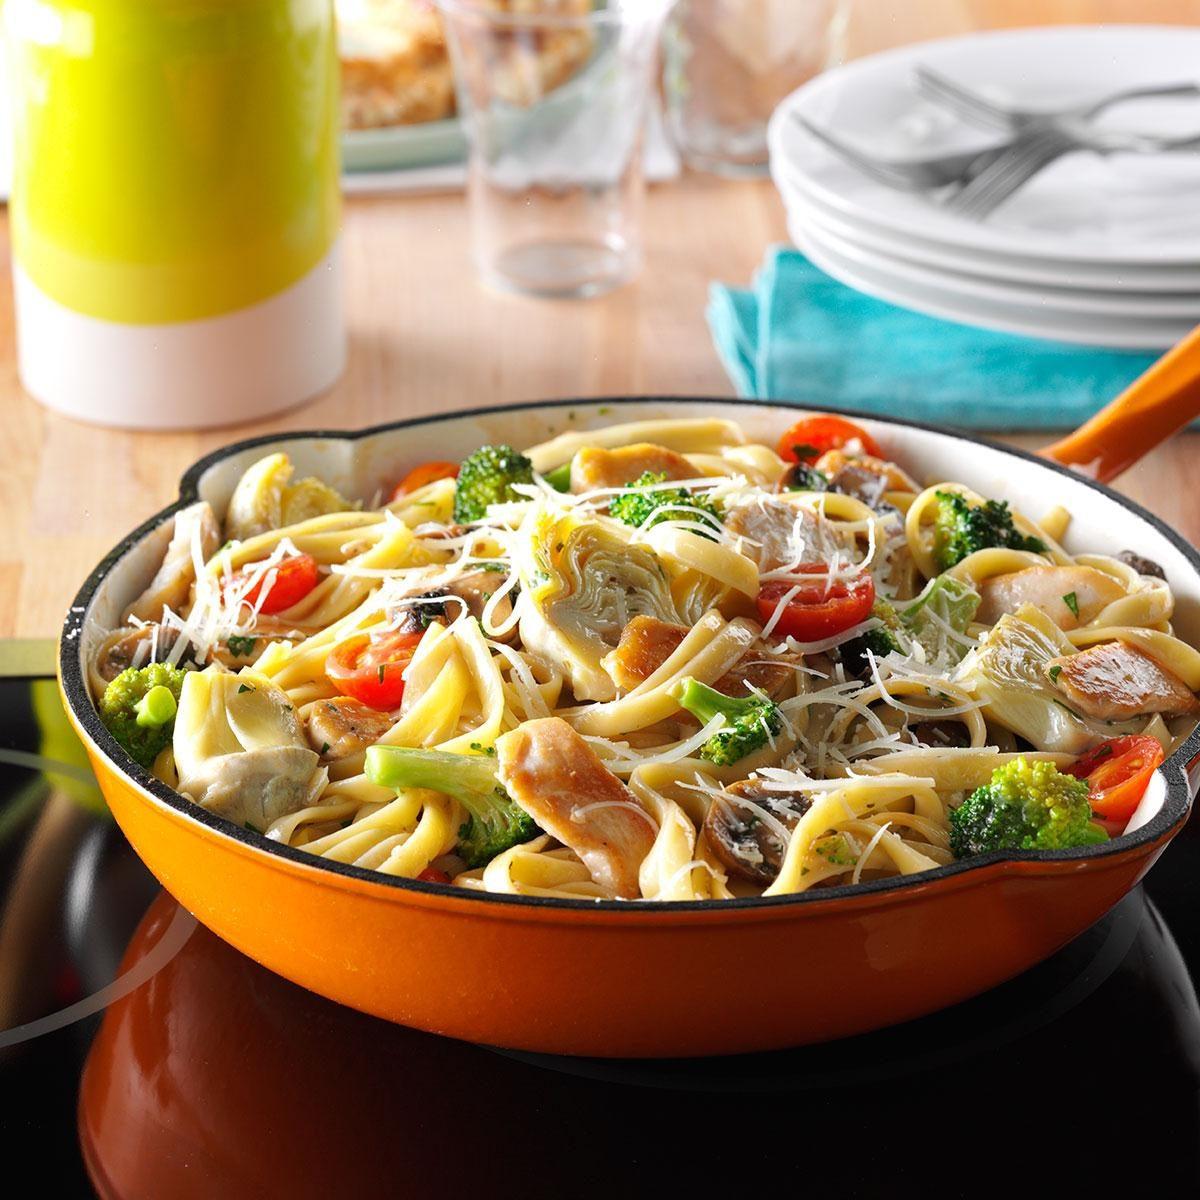 Good Dinner Recipes For 4: Quick & Easy Family Dinners